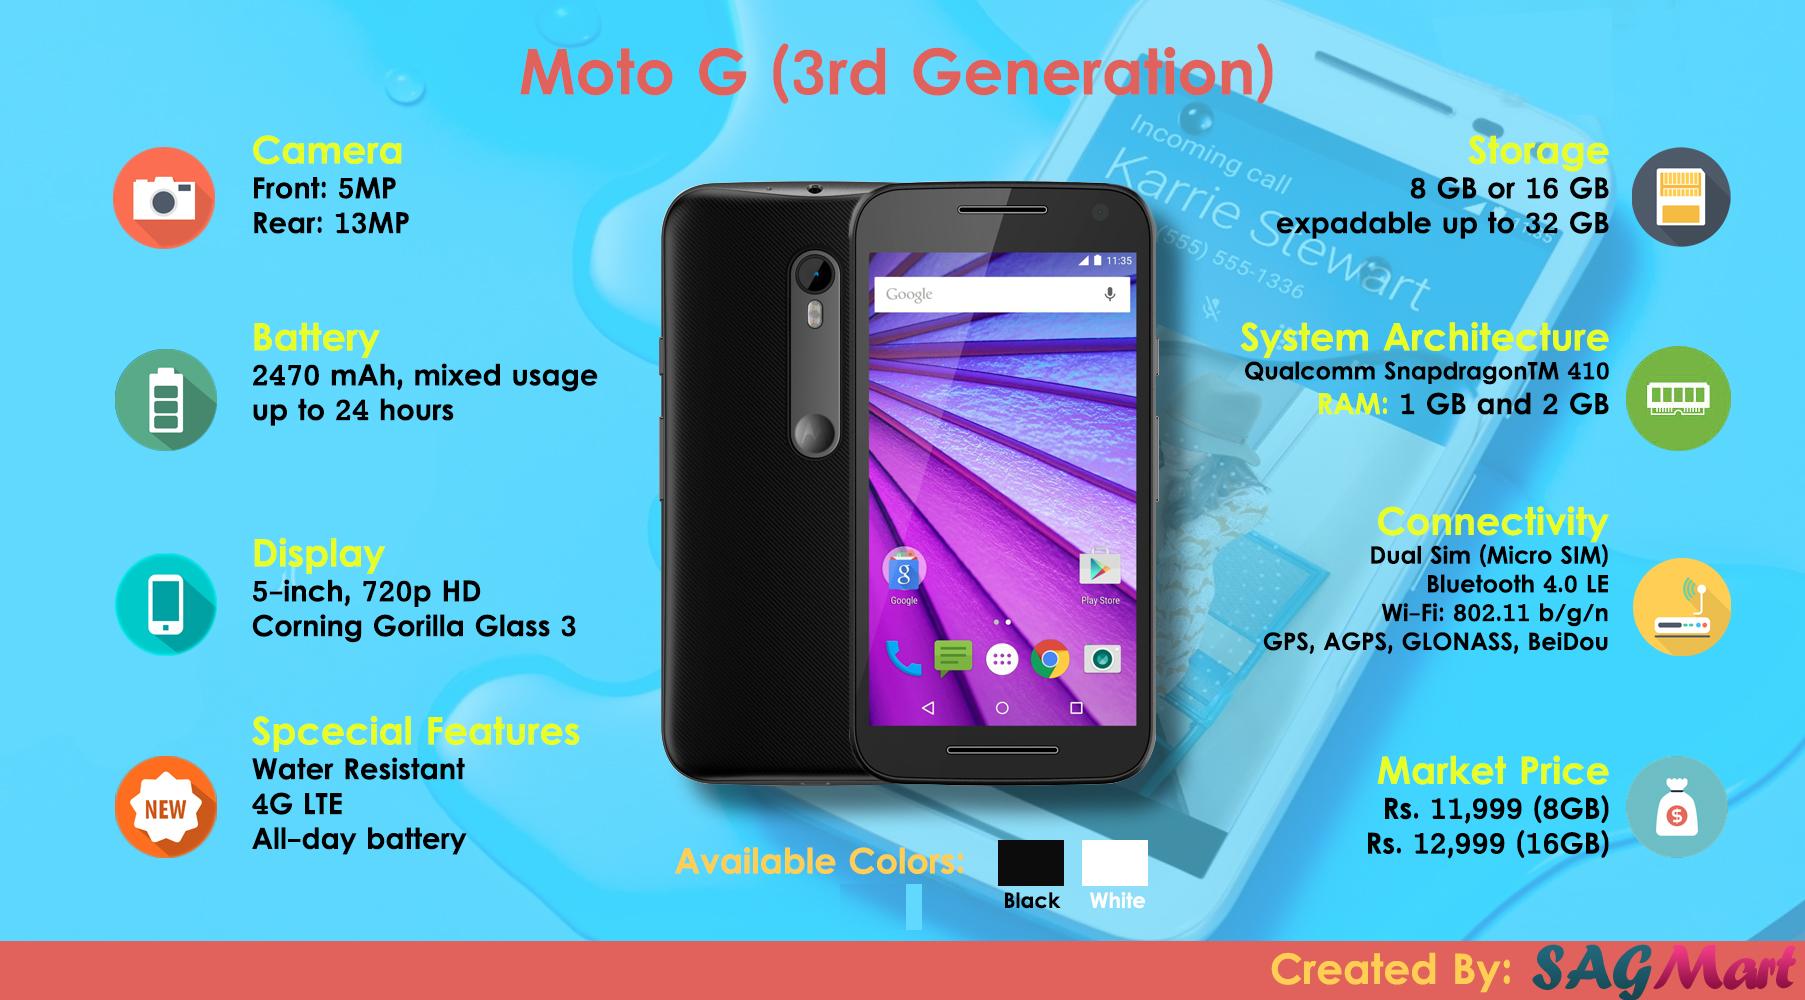 moto g 3rd Gen infographic